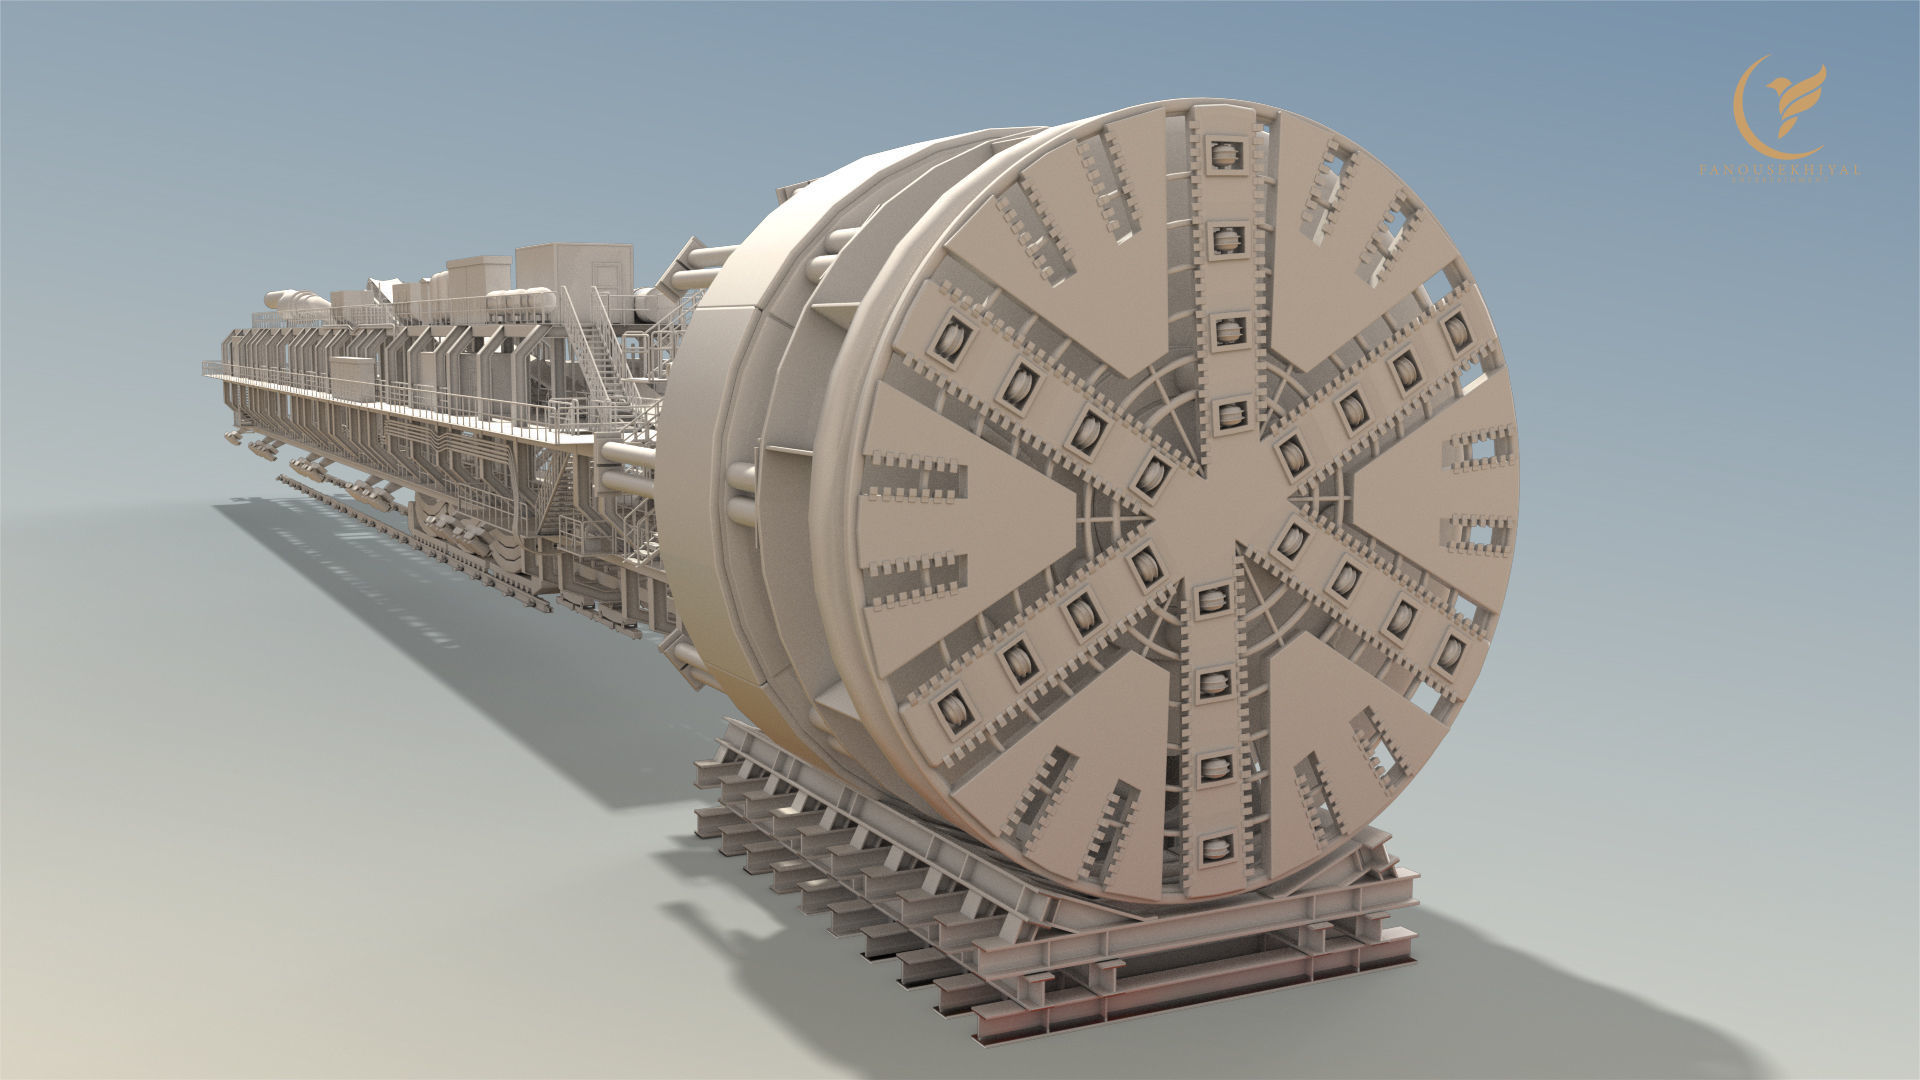 TBM-High detail Tunnel Boring Machine